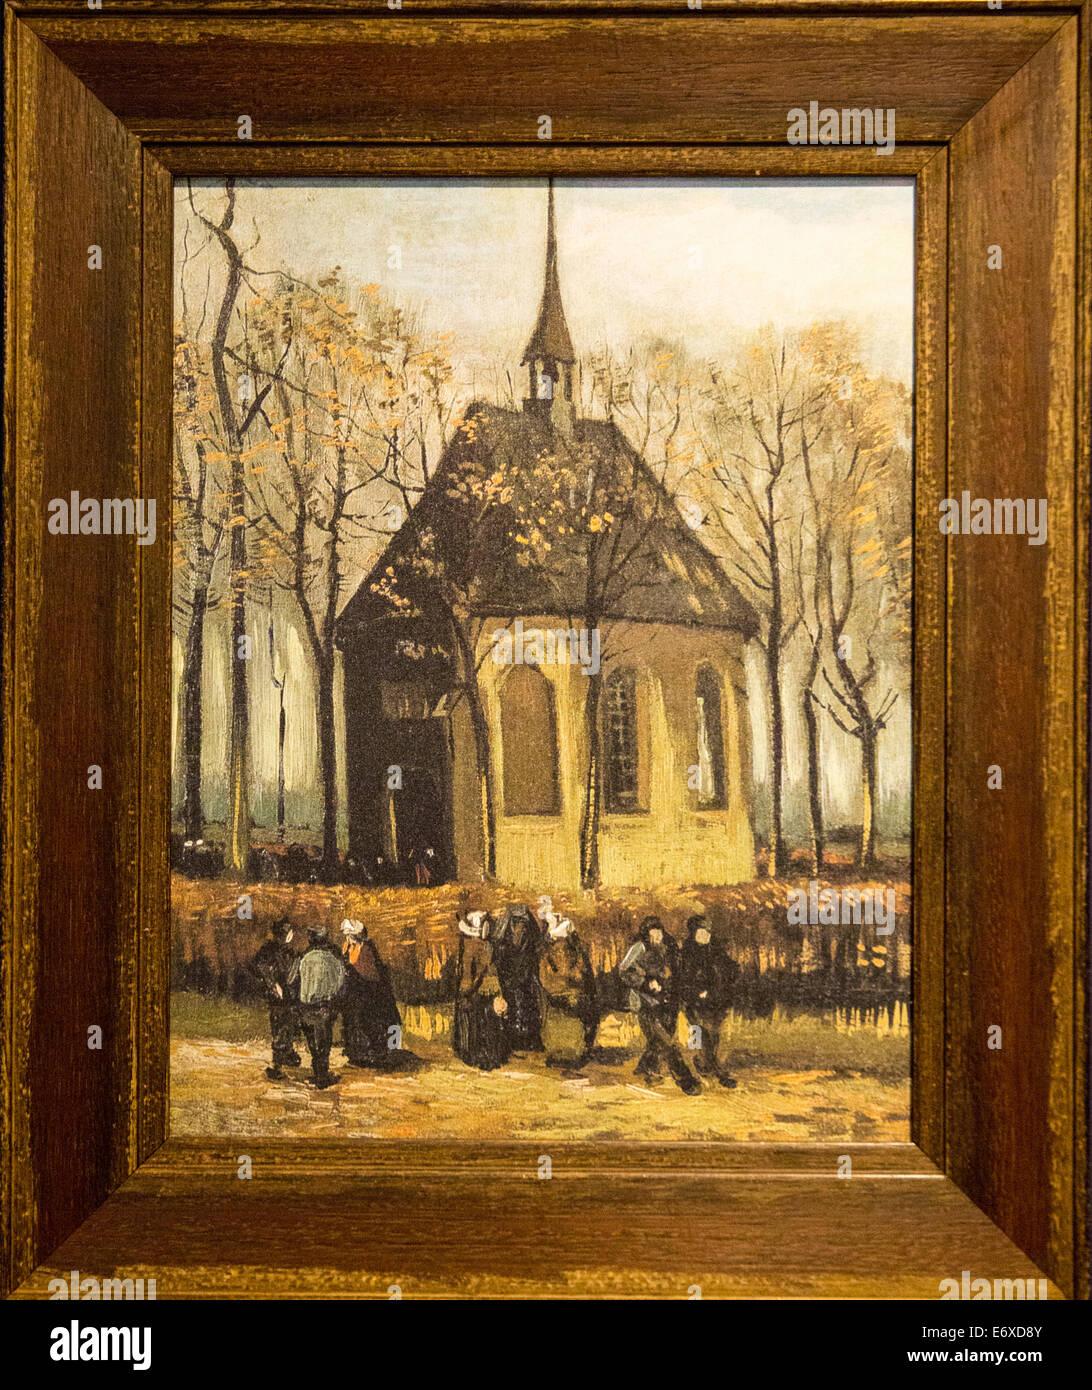 Netherlands. Nuenen. Village of Vincent van Gogh. Museum called Stock Photo: 73110603 - Alamy